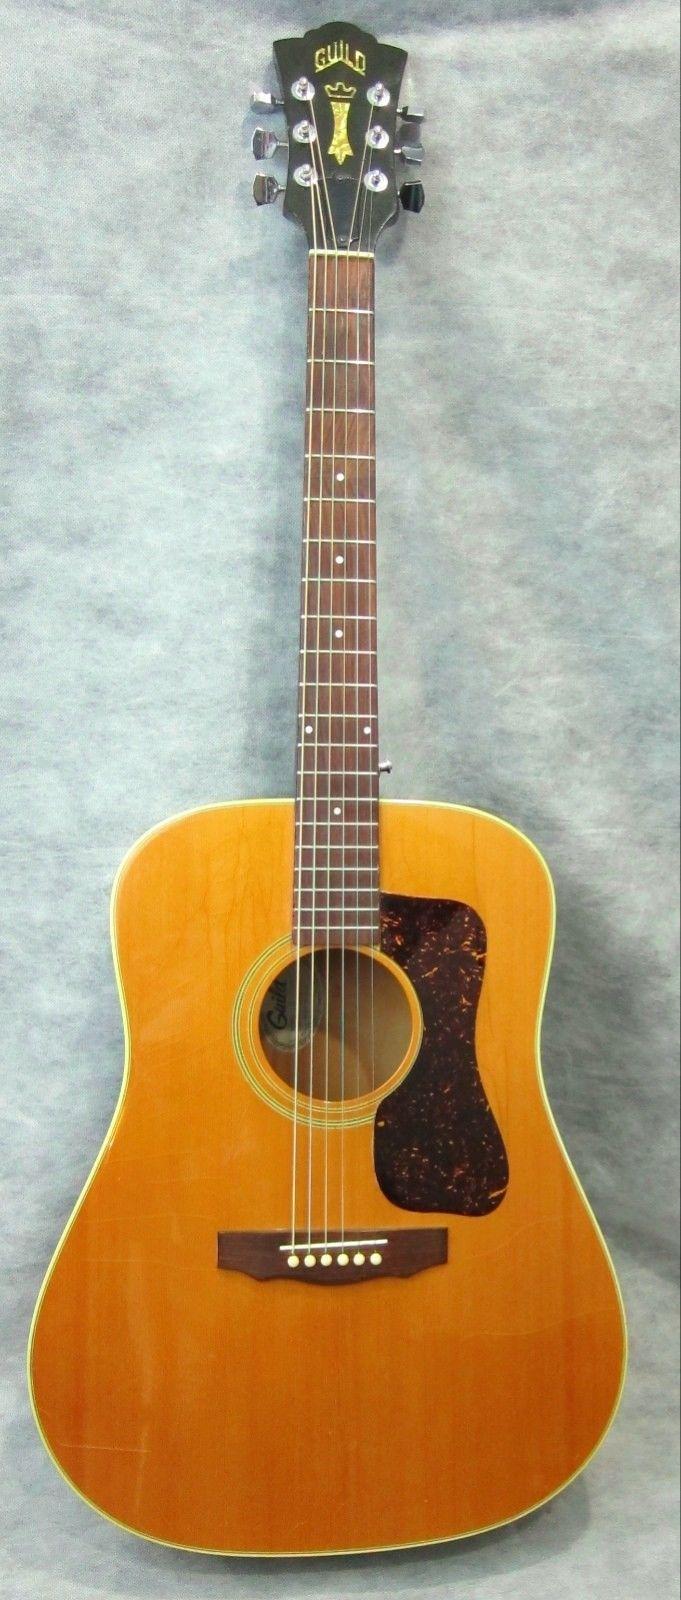 Vintage Guild Acoustic Guitar Model G37nt 1979 Arch Back Dark Back Clean W Case Guild Acoustic Guitars Guild Guitars Guitar